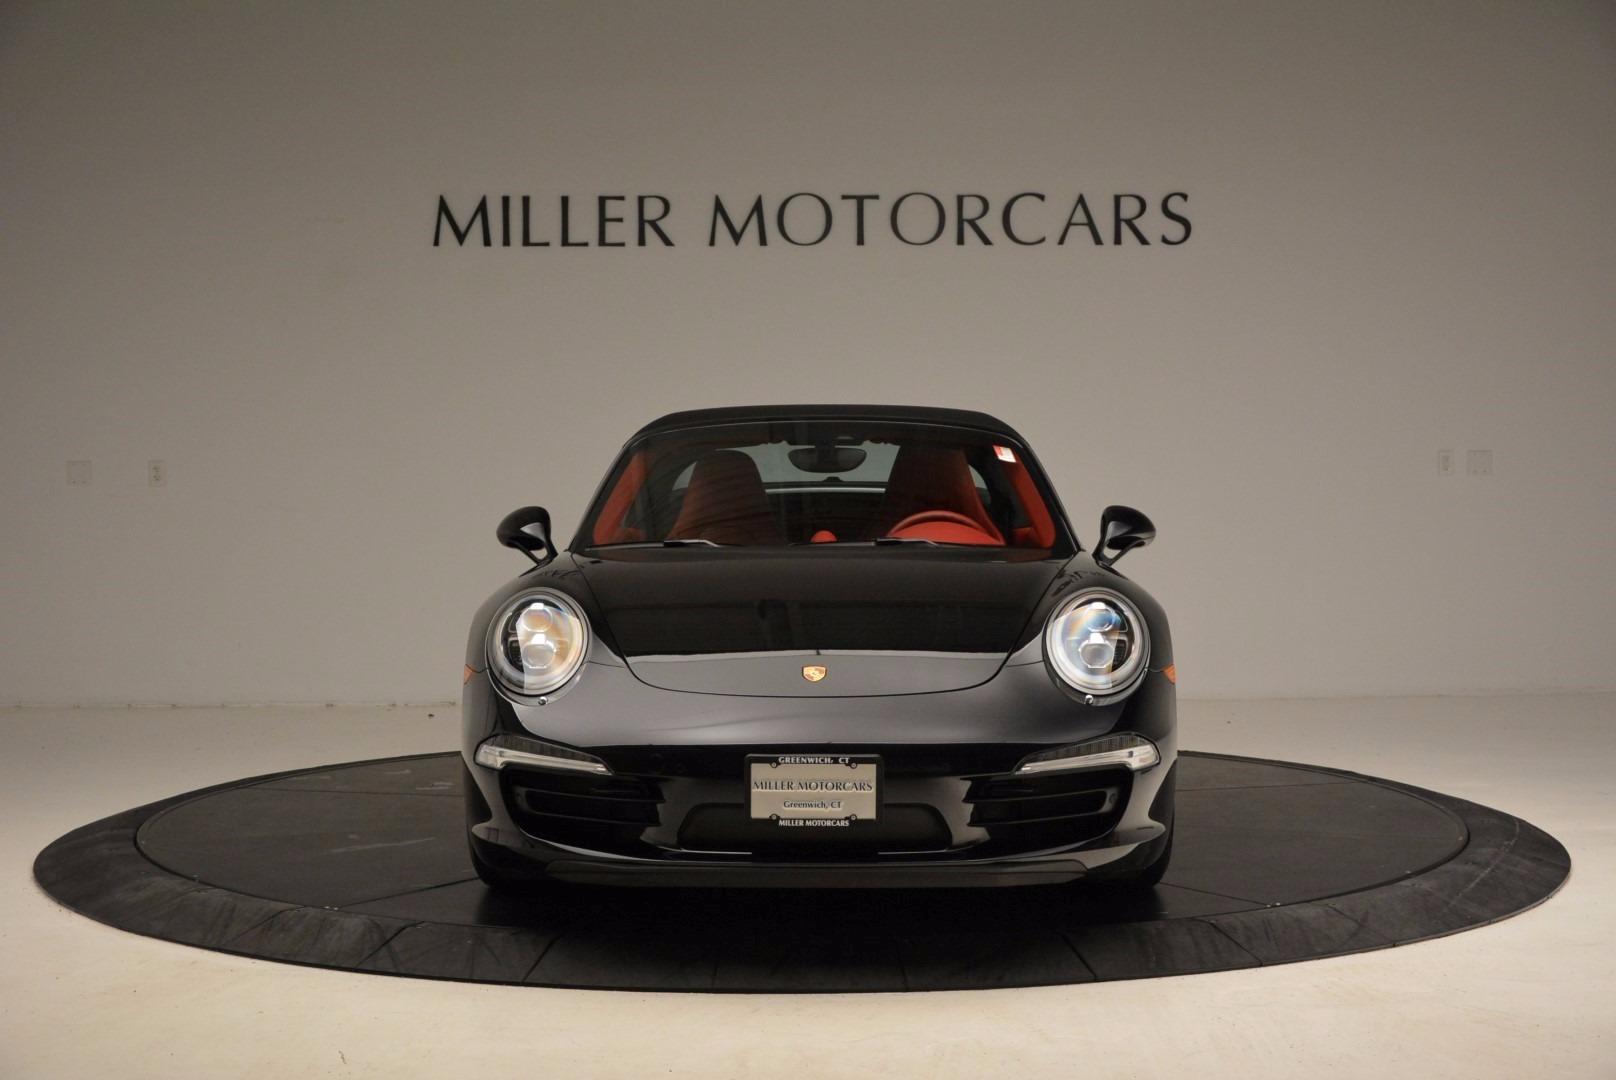 Used 2015 Porsche 911 Targa 4S For Sale In Greenwich, CT 1476_p20